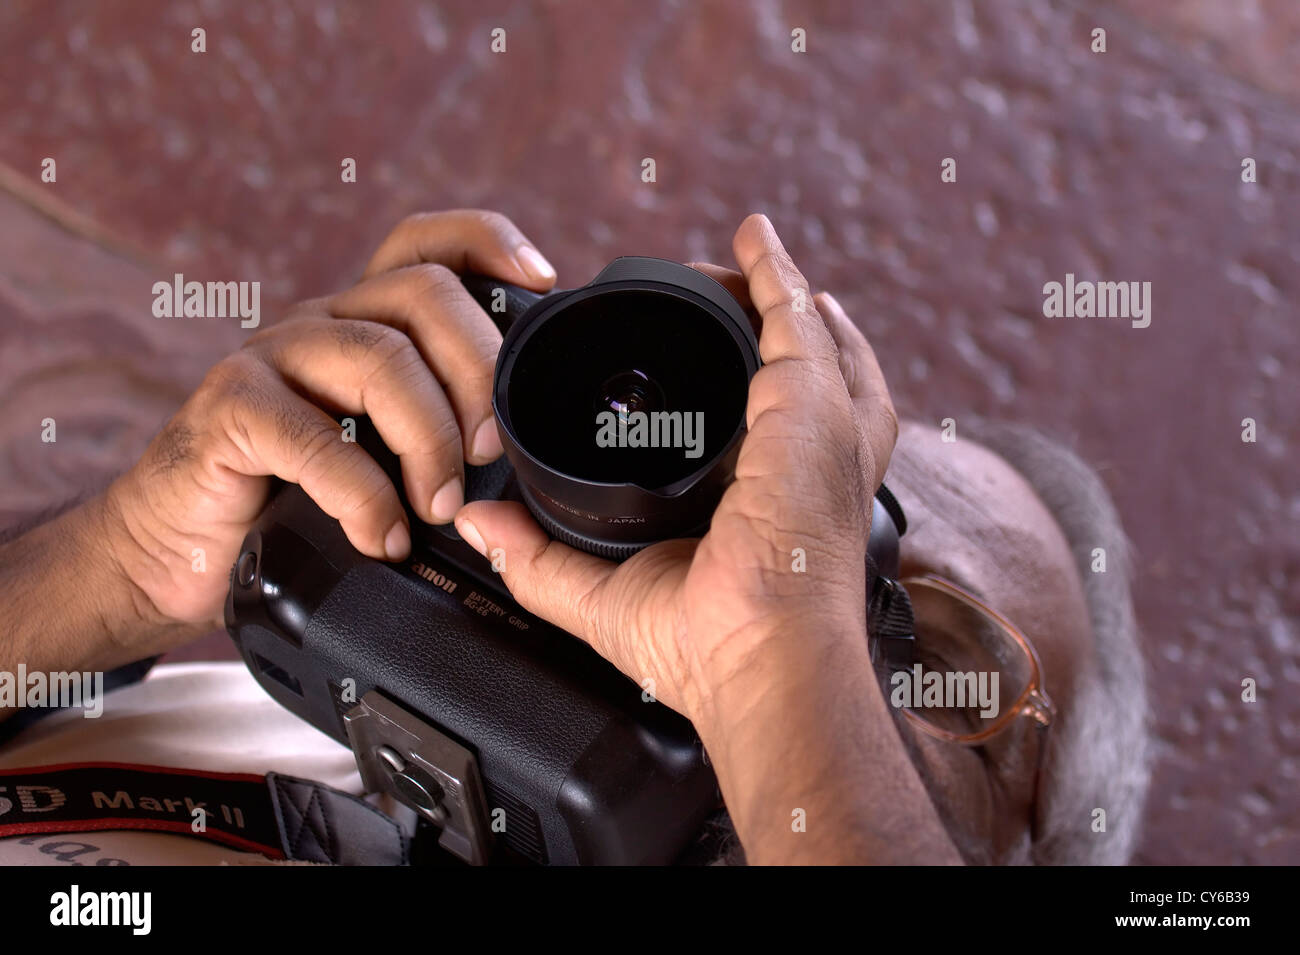 Telecamera, obiettivo riprese, tiro, fotografo, Photo Shoot, temi fotografici, reportage, avventura.Photo Shoot,hobby.dilettanti Immagini Stock